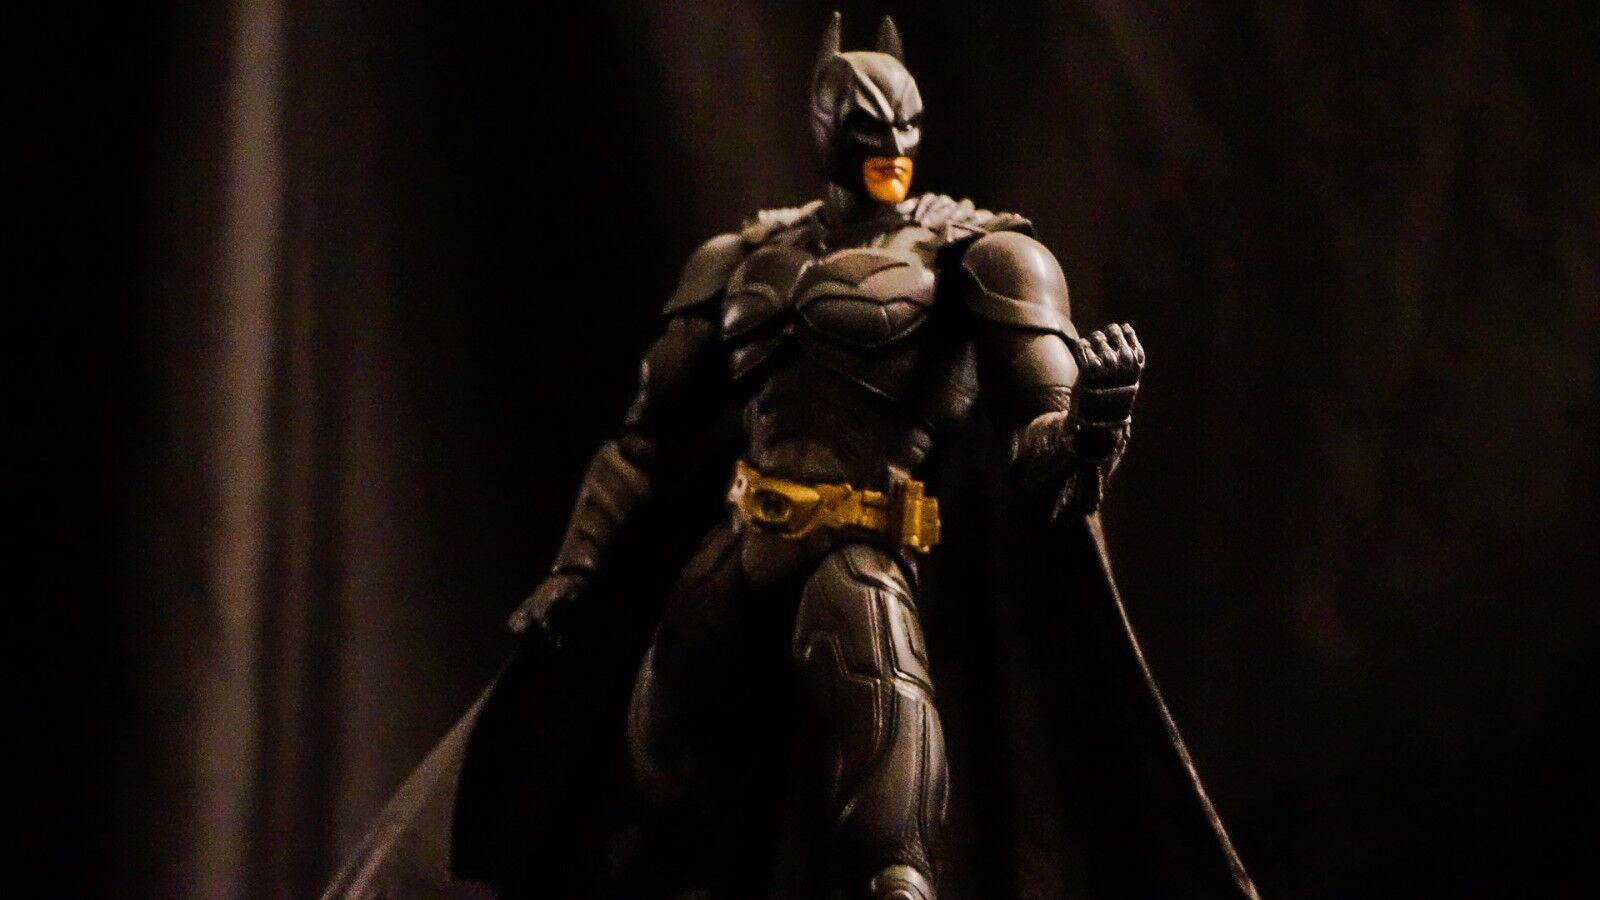 Square Enix Play Arts Kai Dark Knight Rises Batman Figure